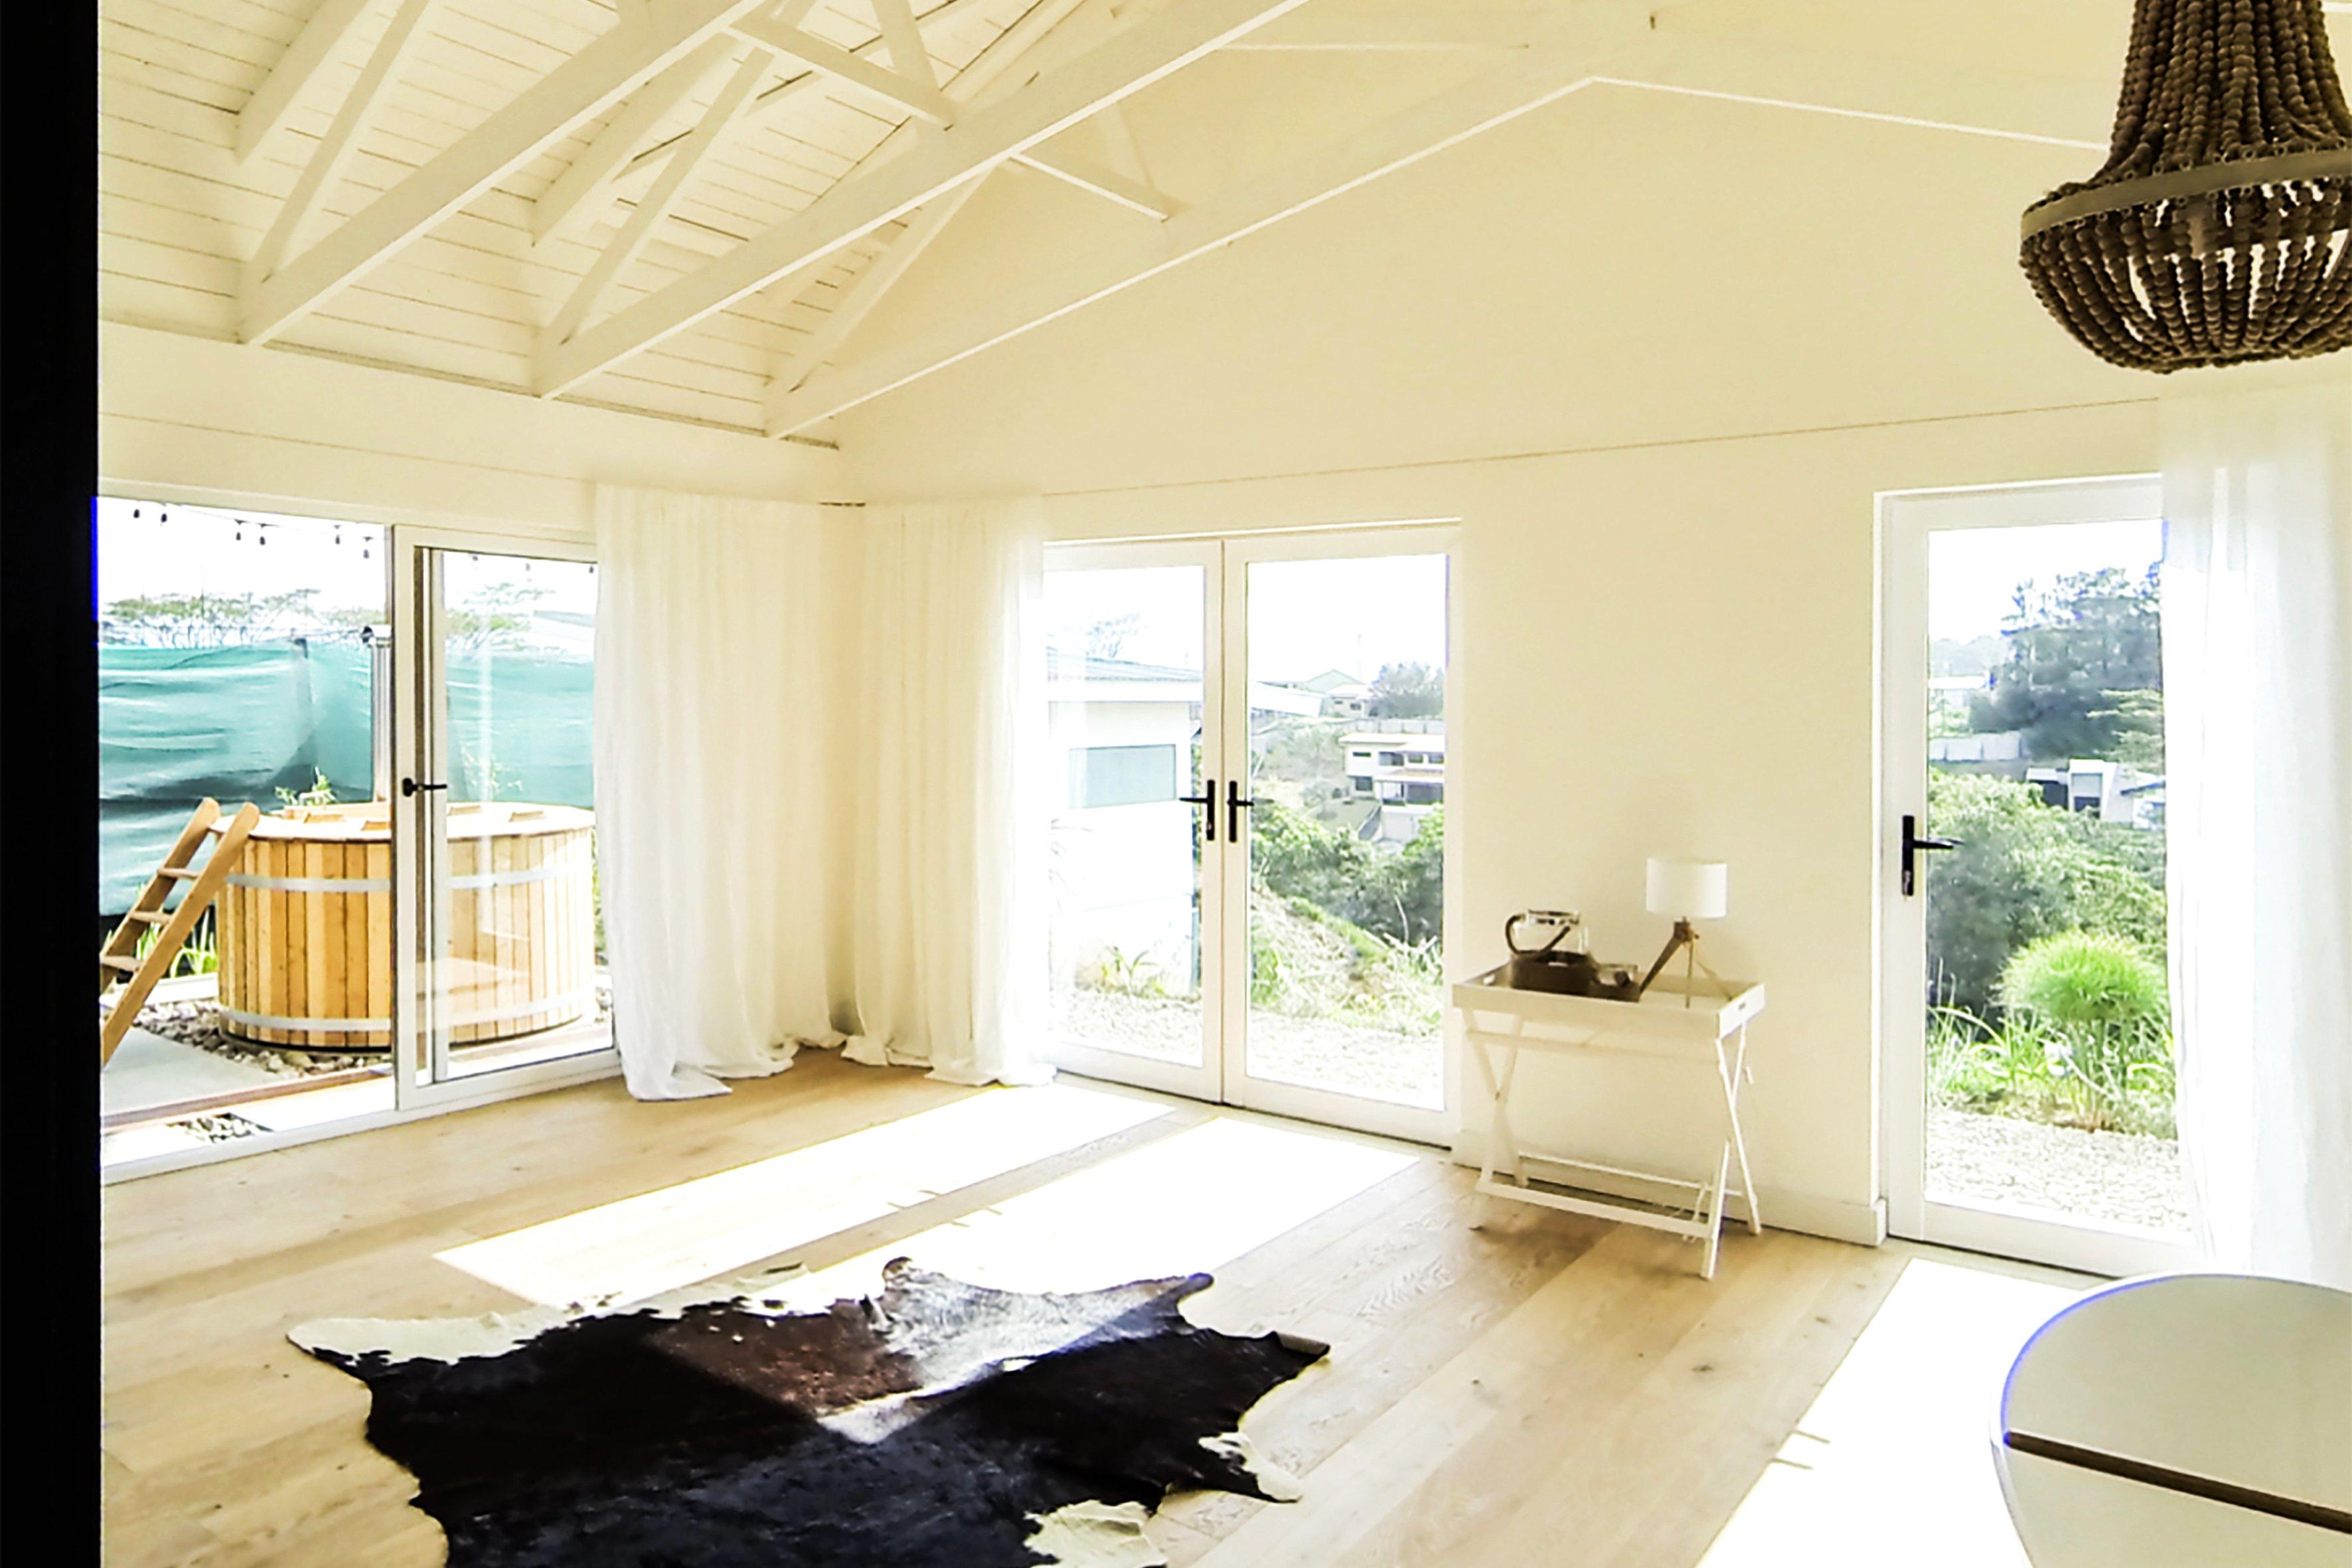 14_B78_bedroom 1.2